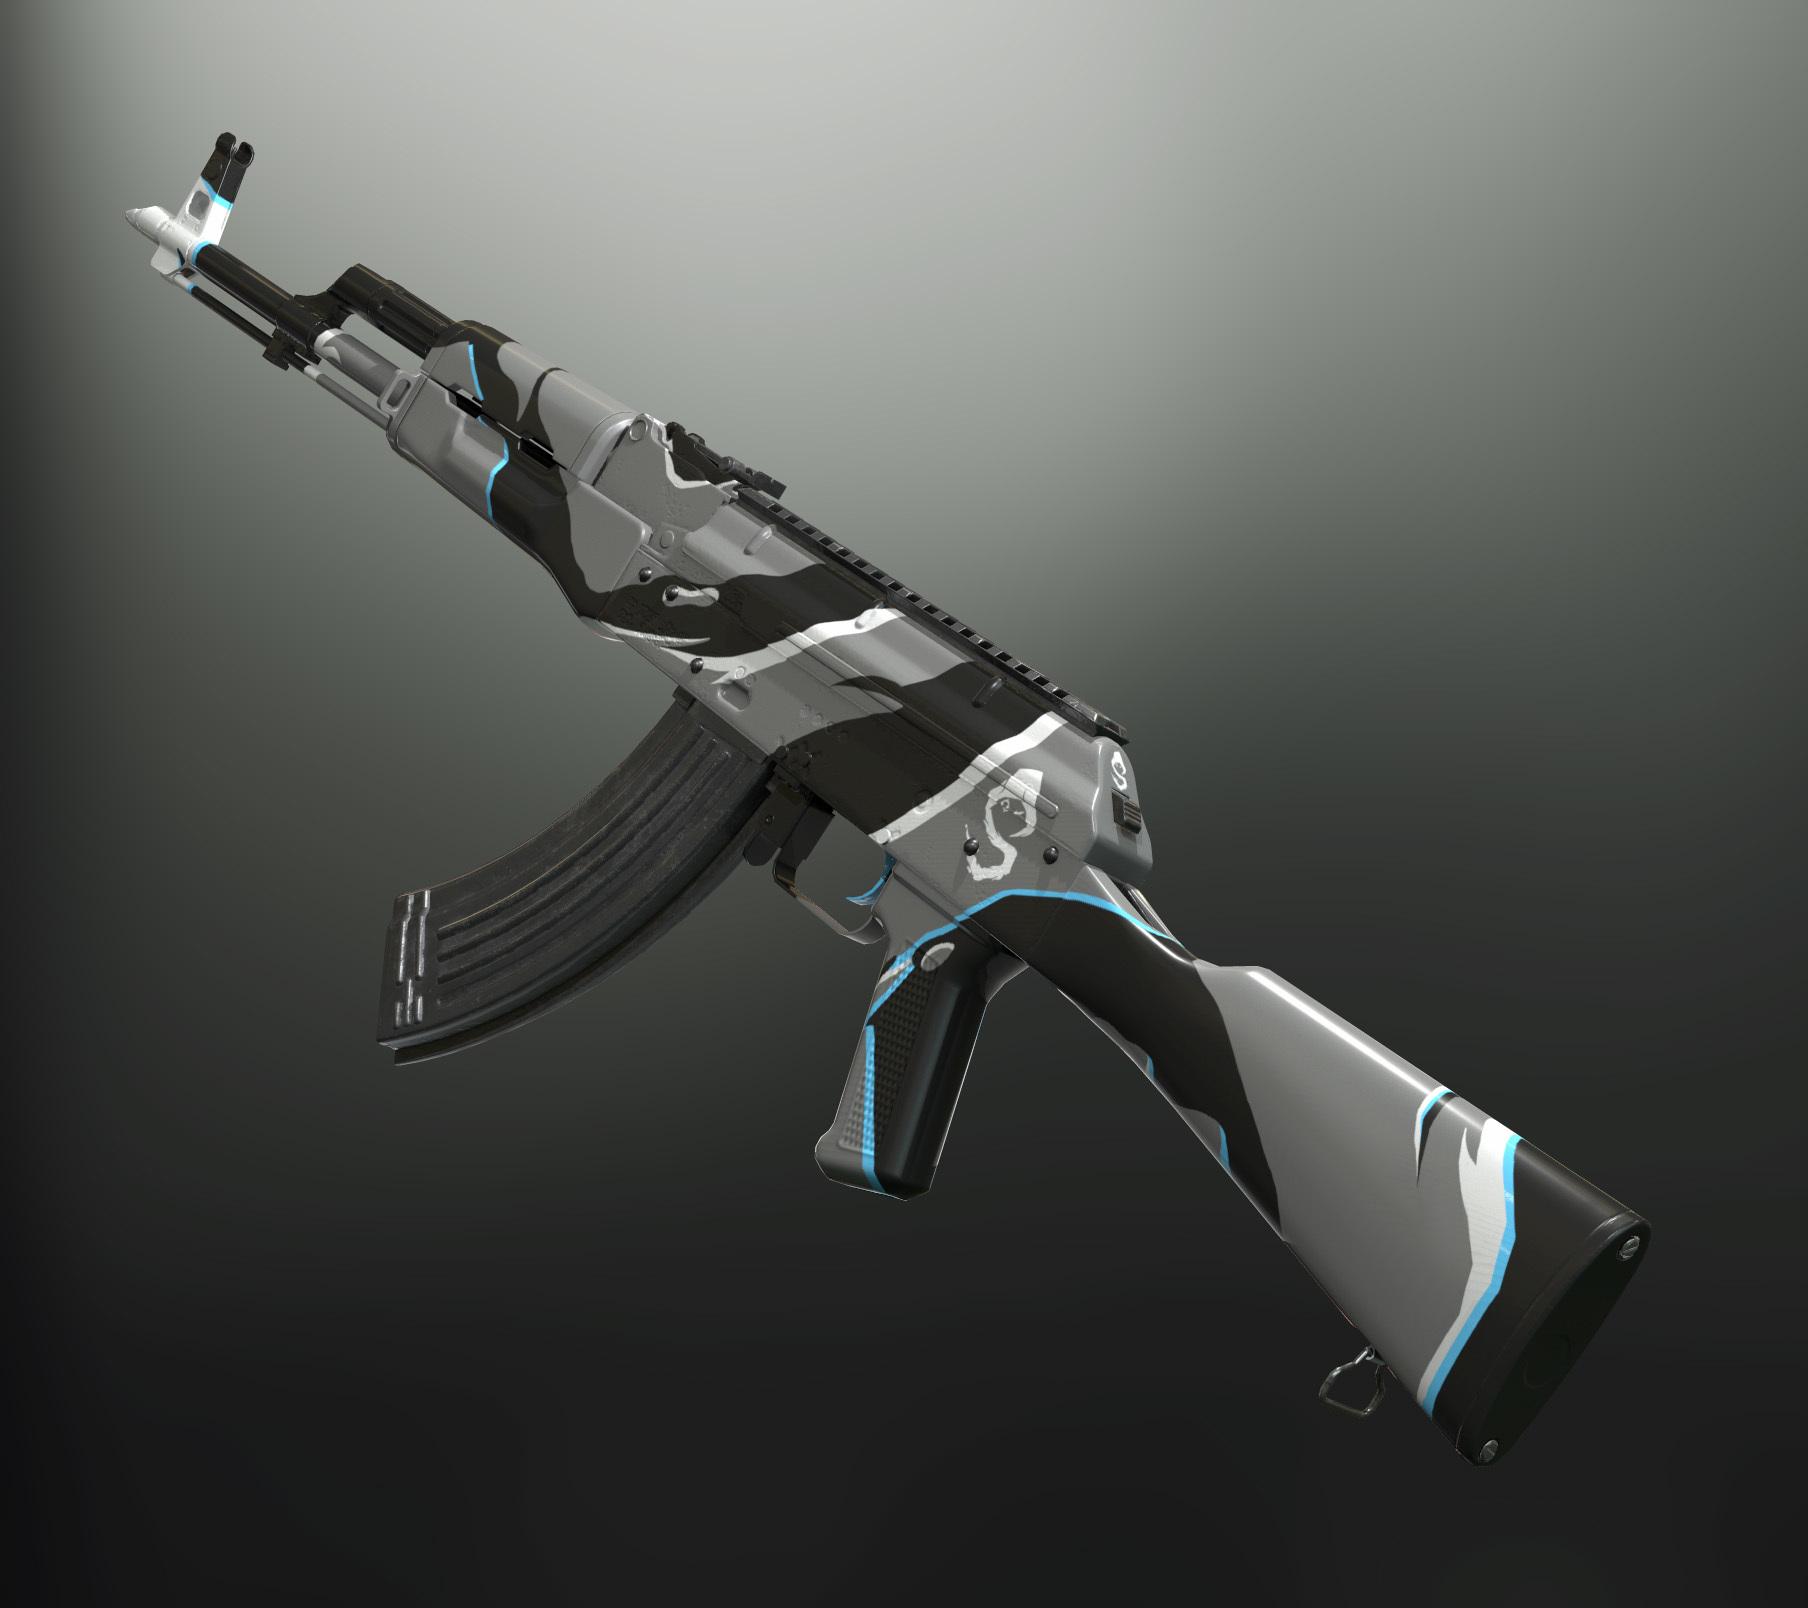 skisn d'armes AKM Drdisrespect PUBG